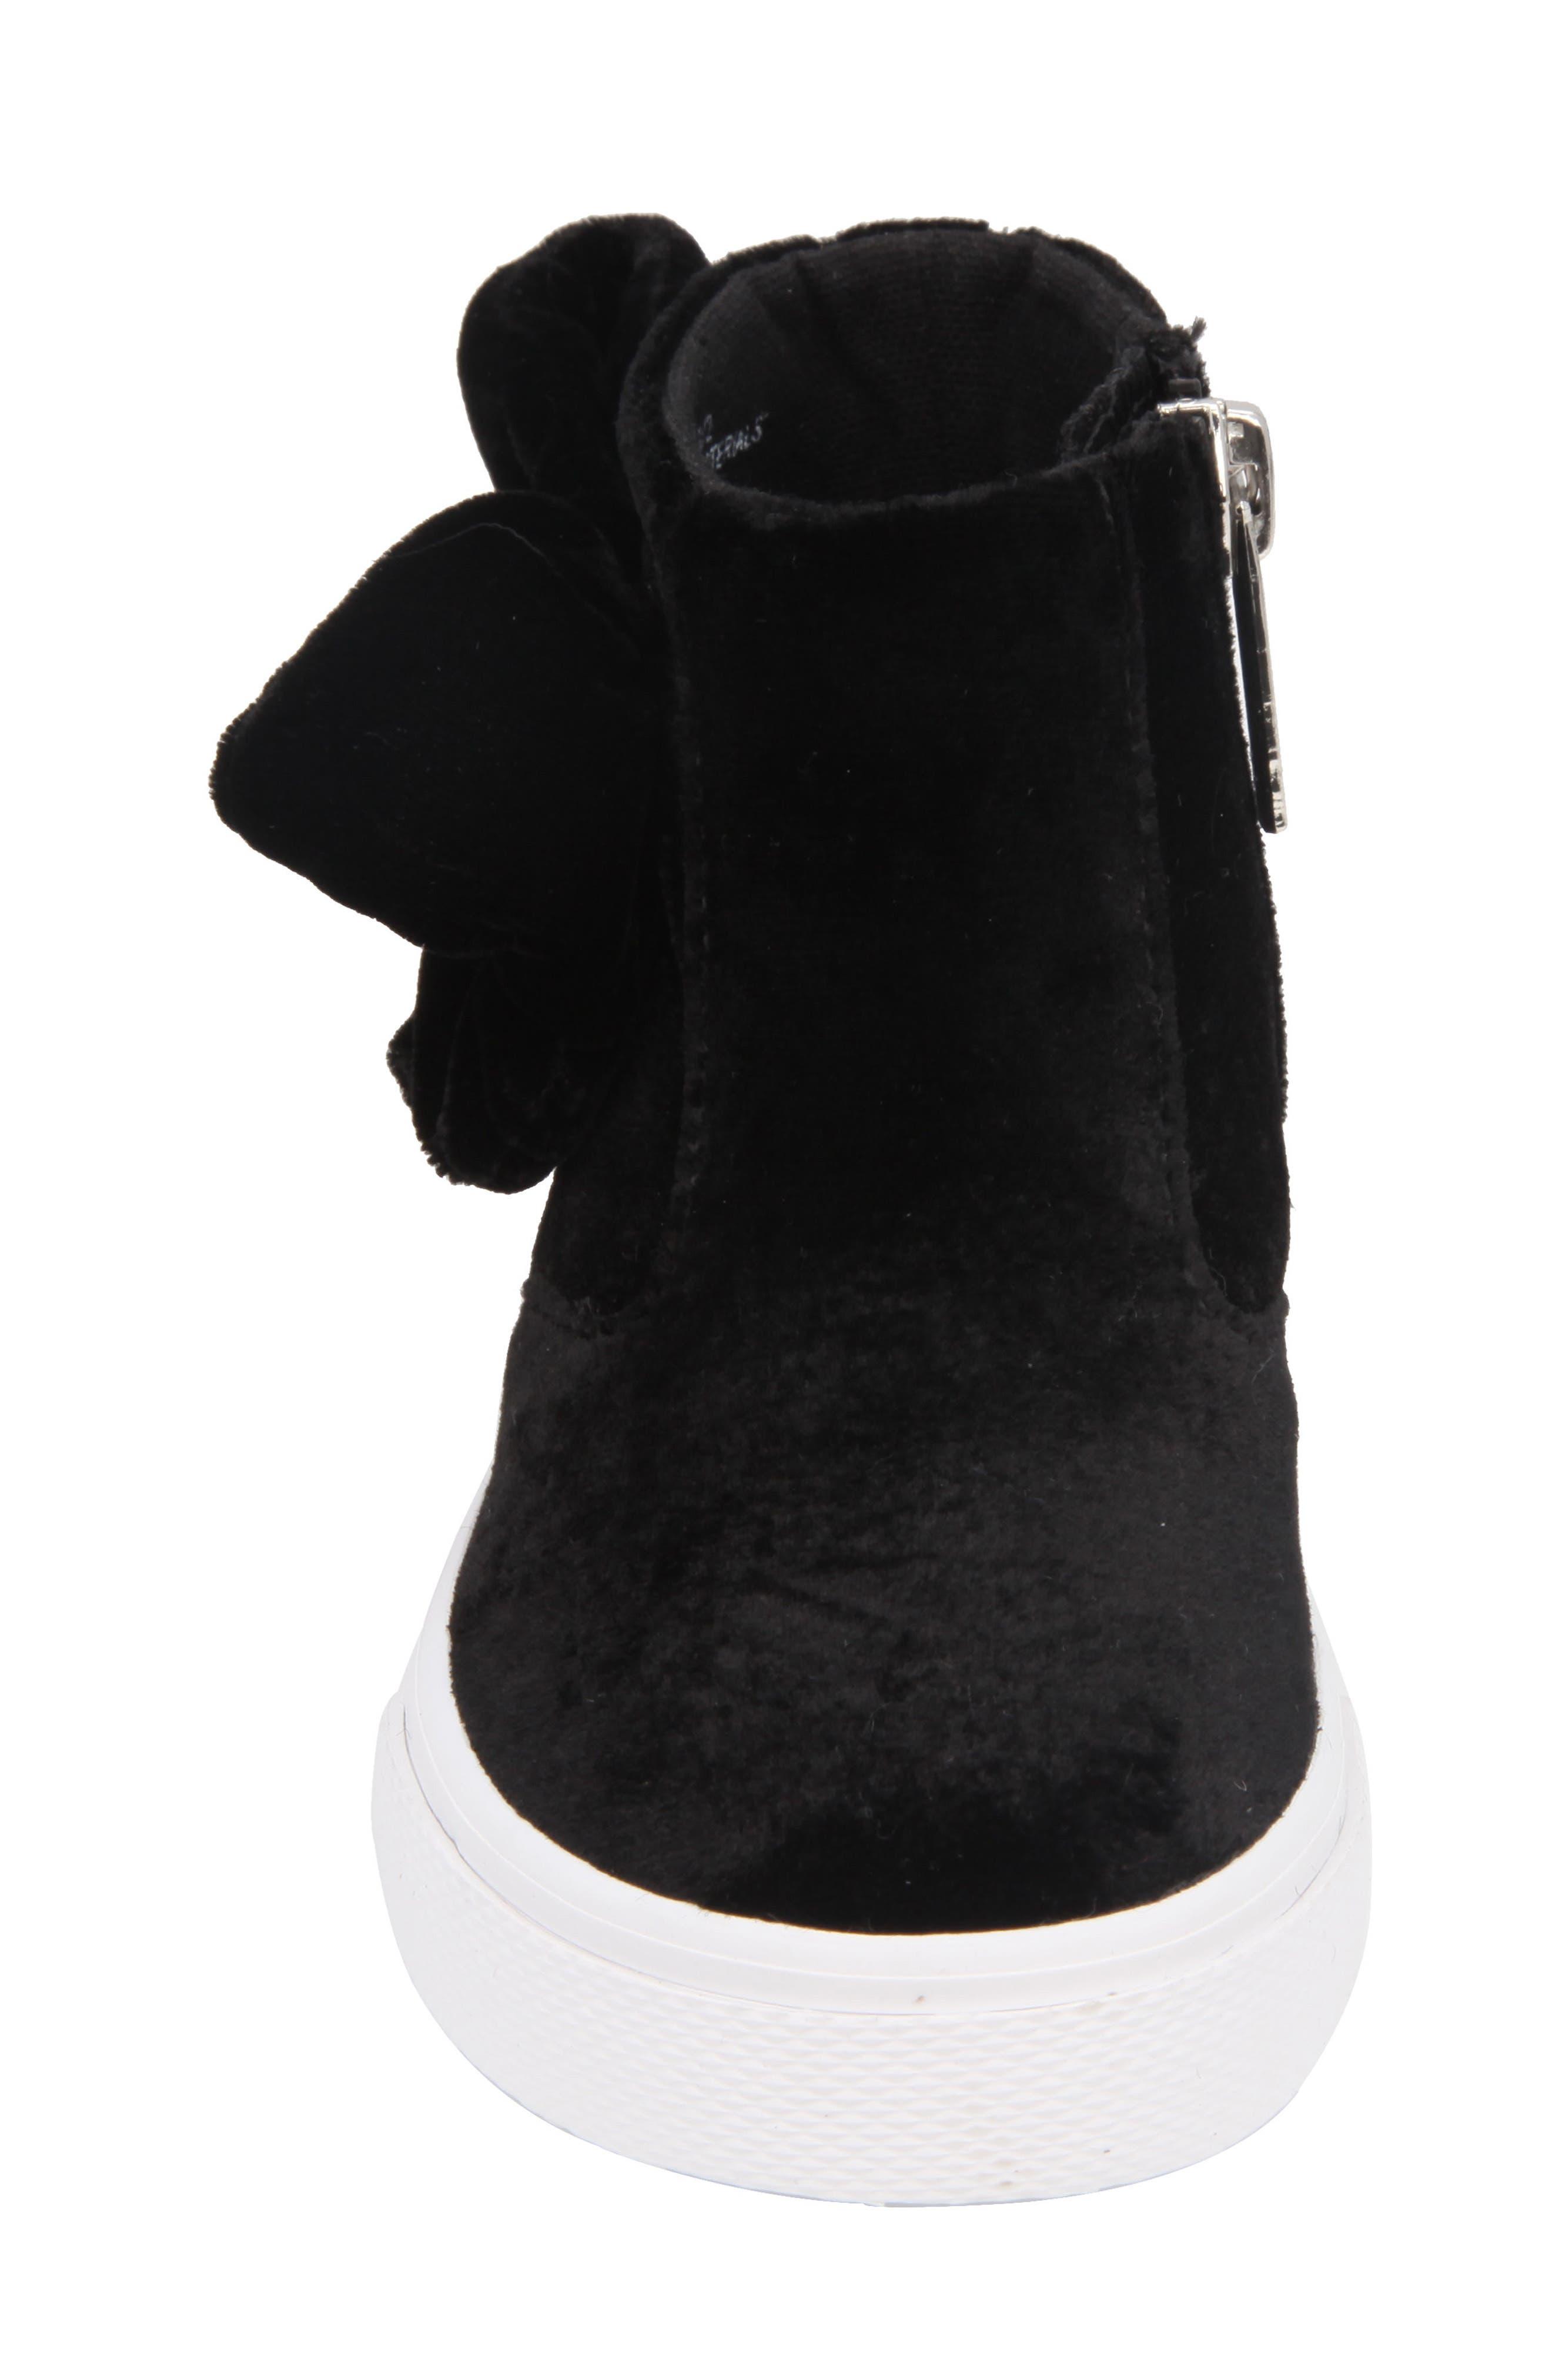 Harolyn Bow Bootie Sneaker,                             Alternate thumbnail 4, color,                             005